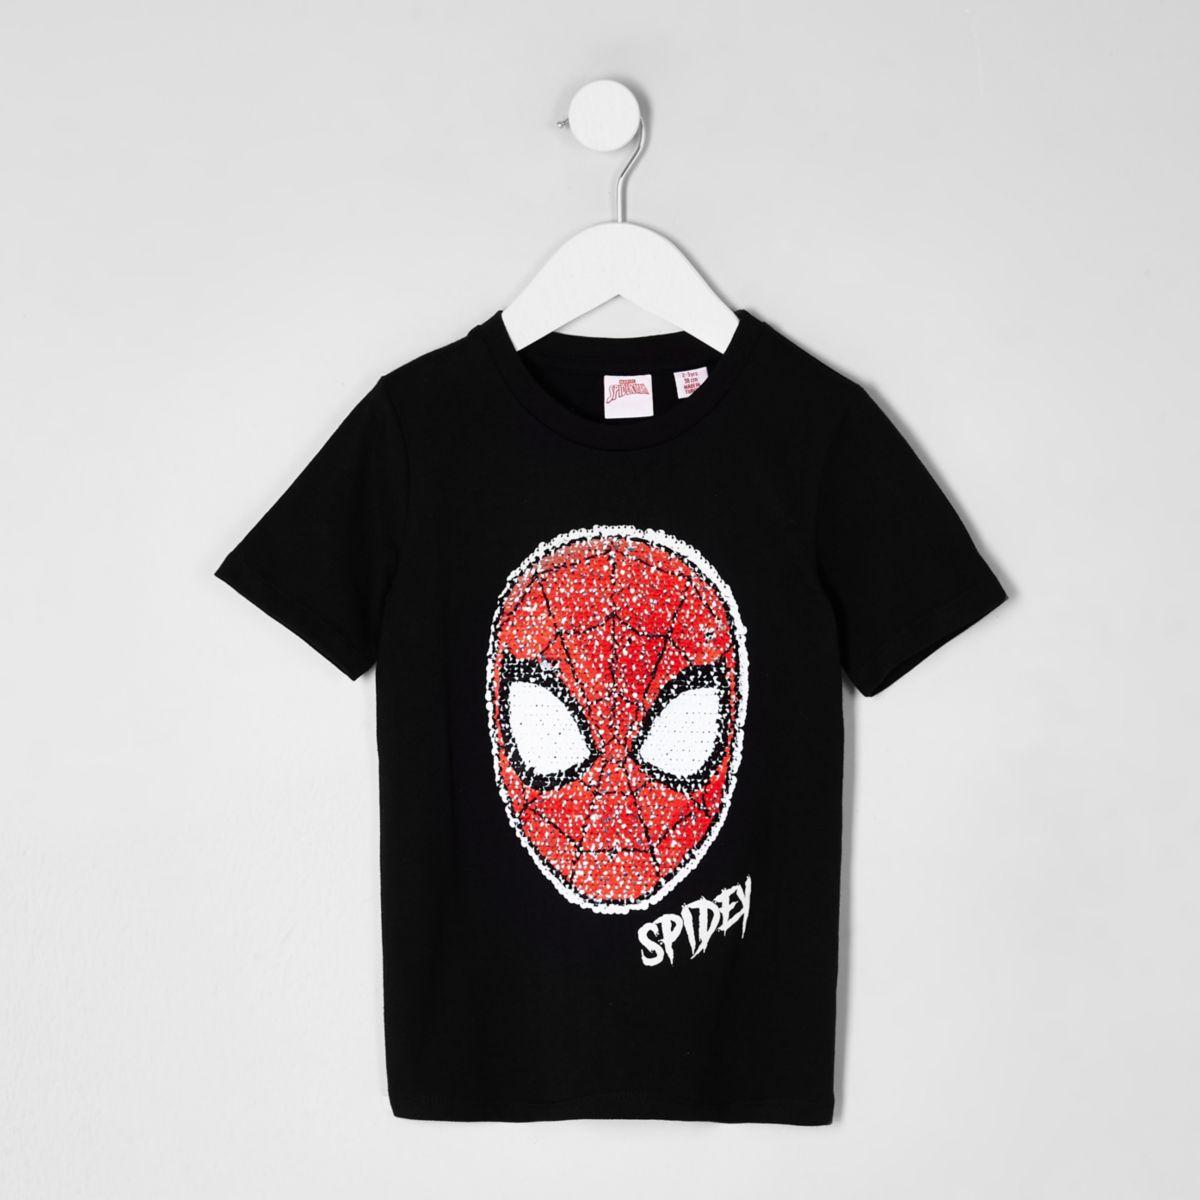 Spider-man – T-shirt noir pour mini garçon